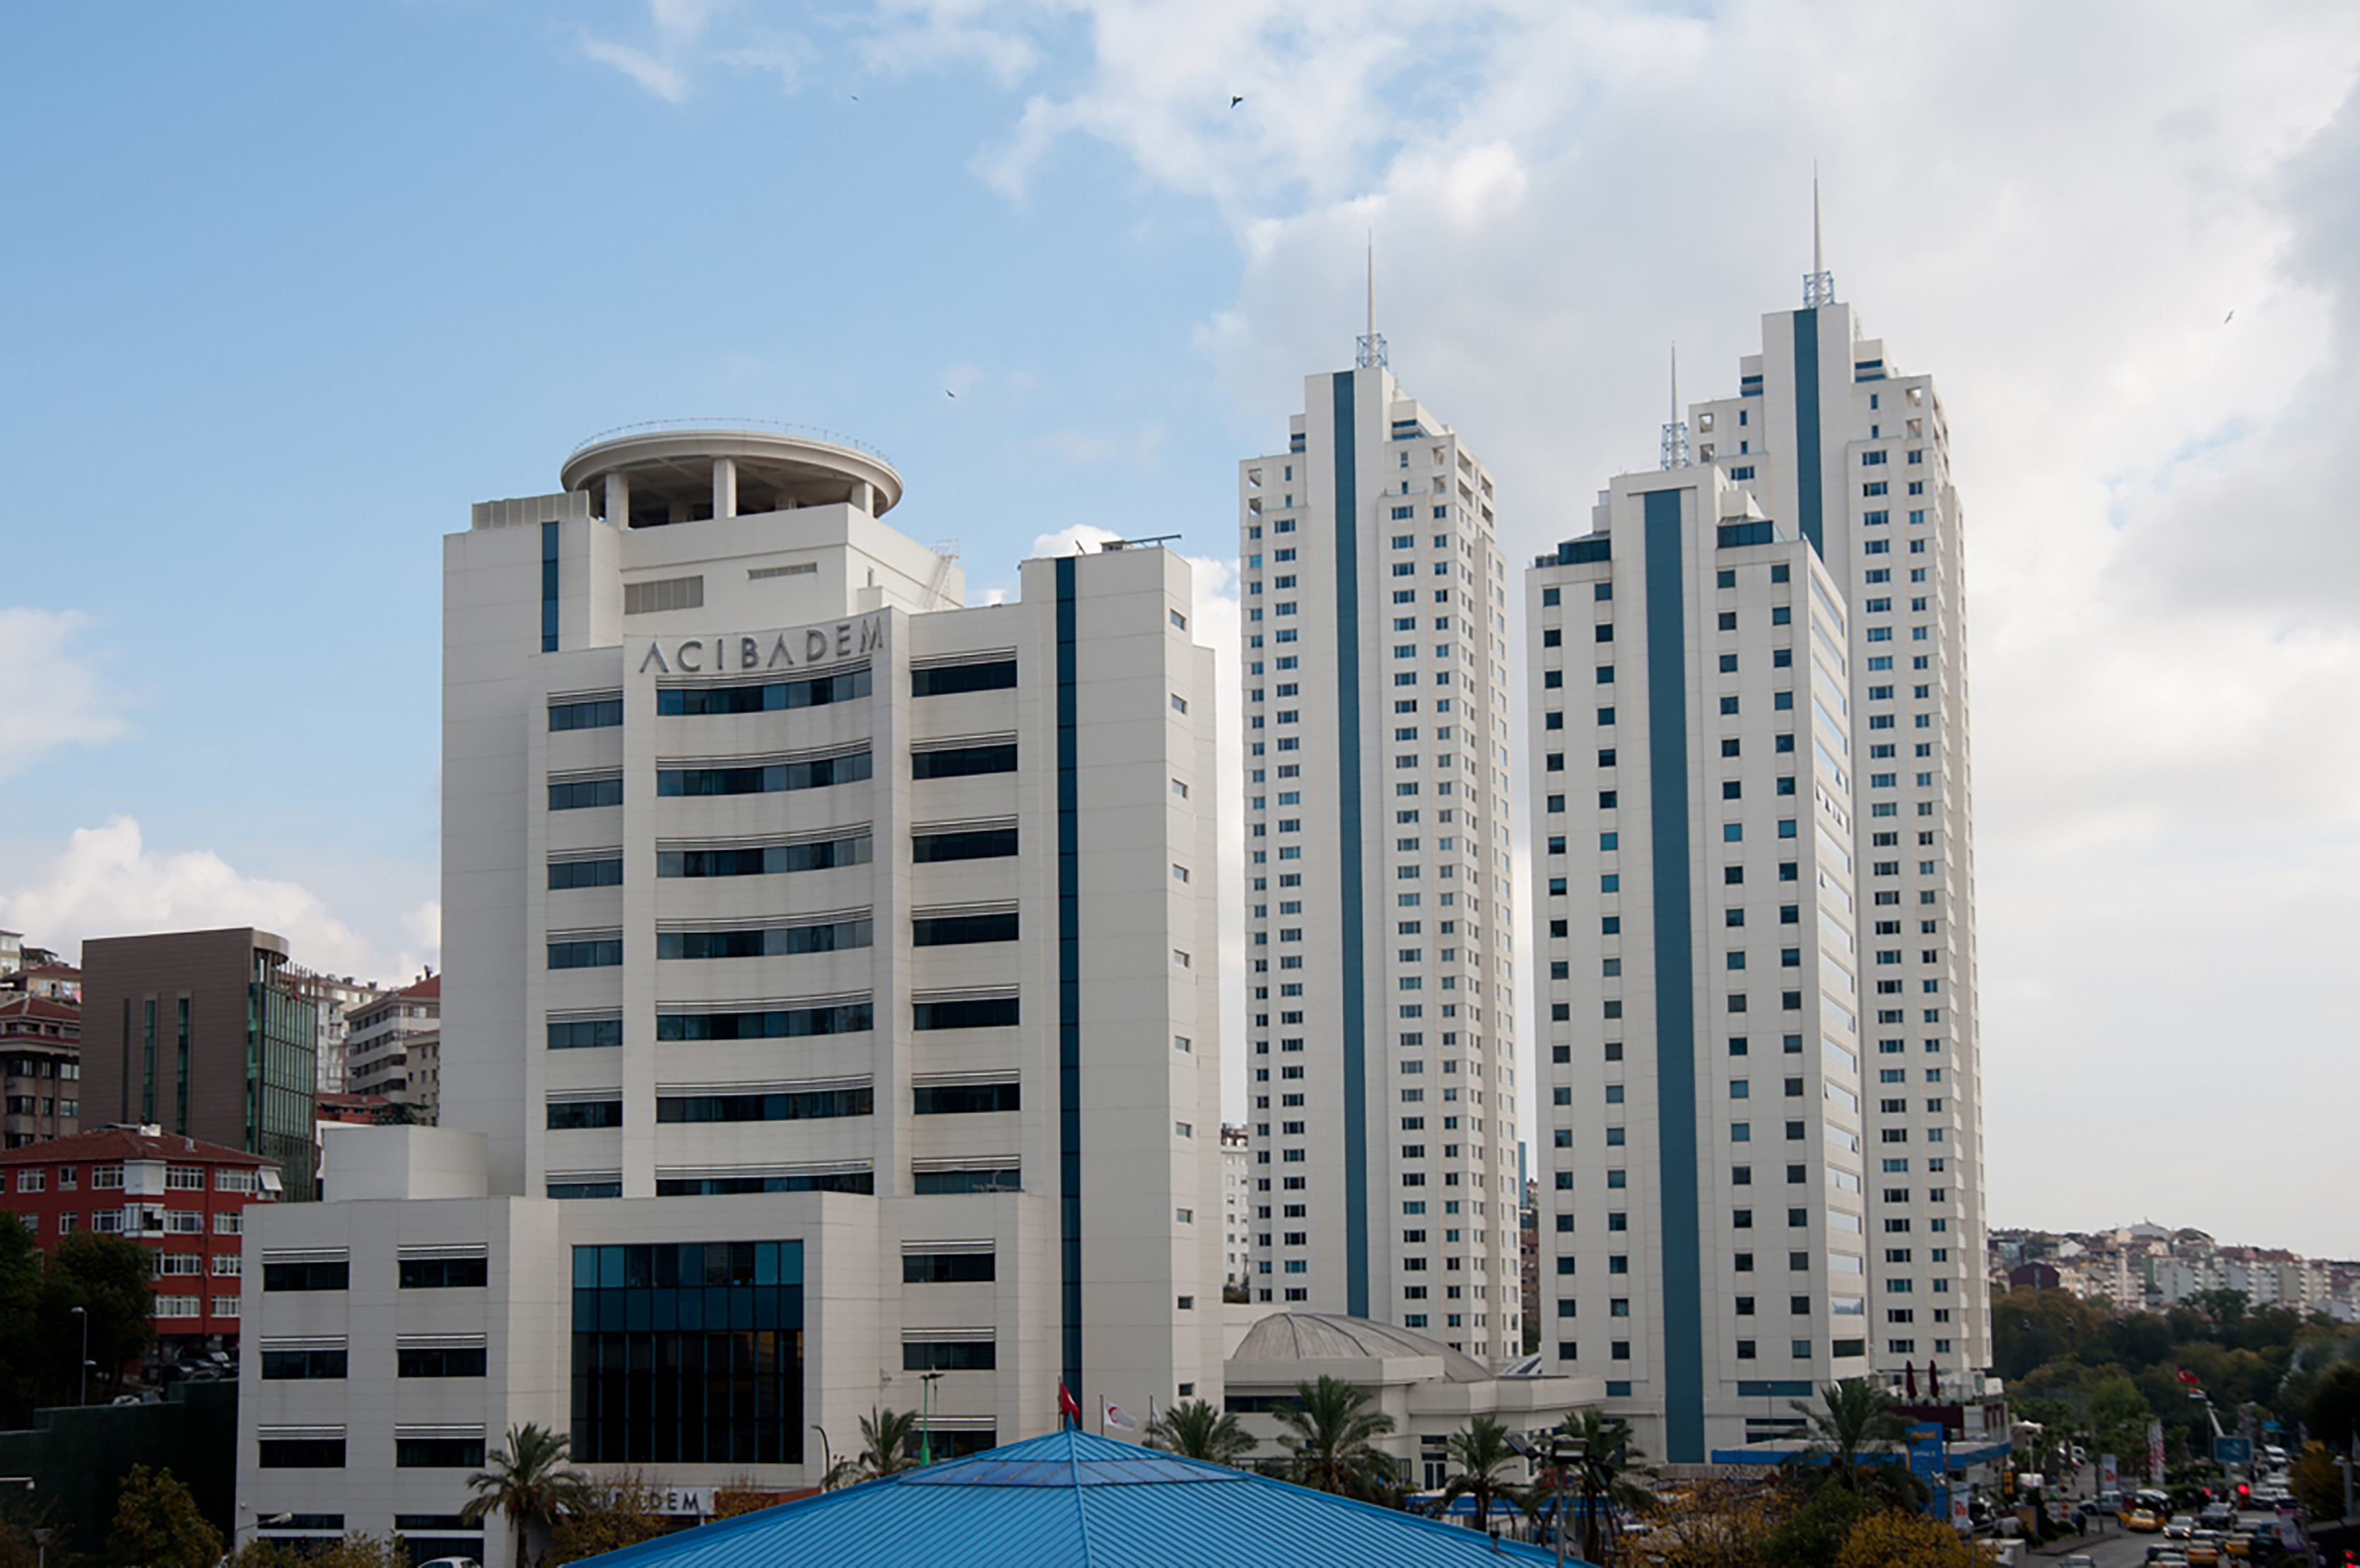 Fibrobeton Acibadem Hospital